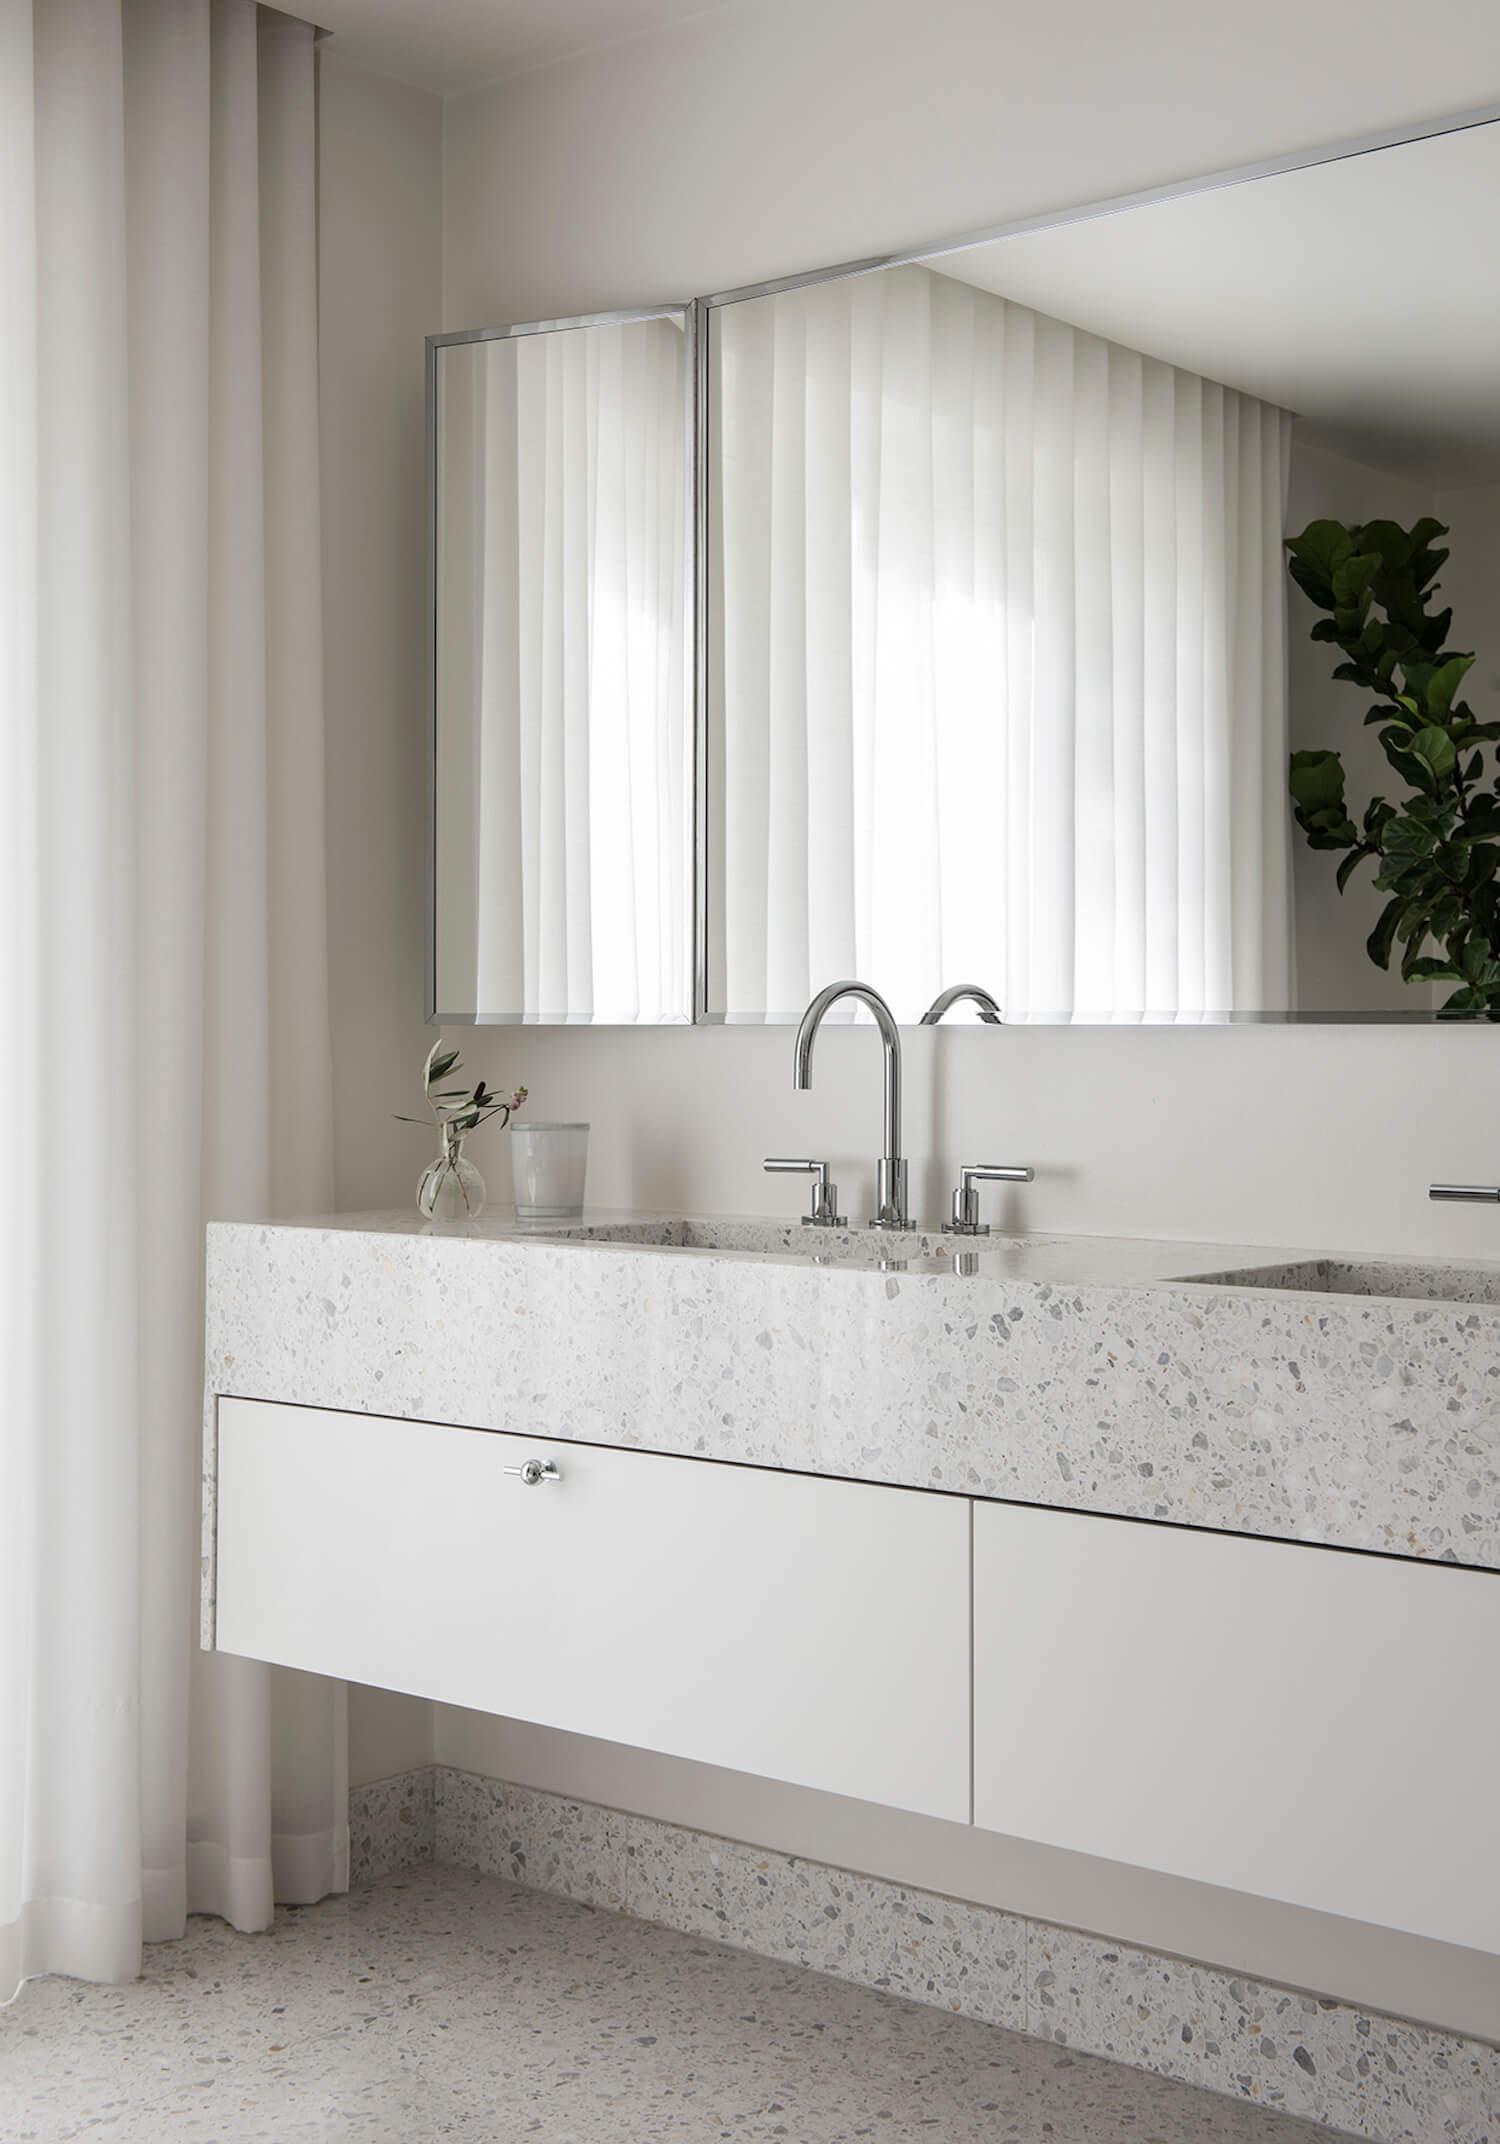 est living interiors lidingo home liljencrantz design 9